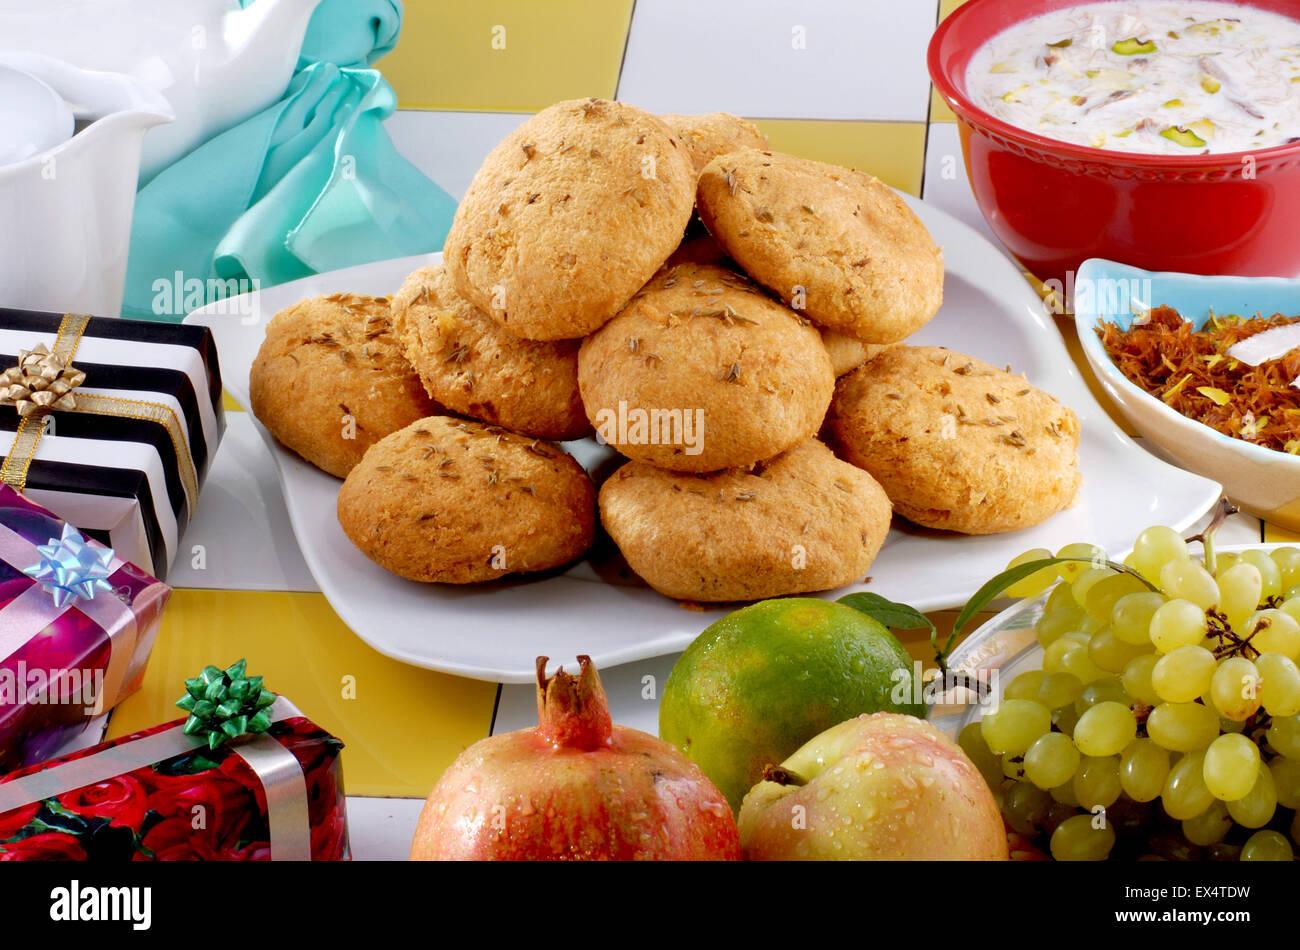 Best Pastry Eid Al-Fitr Food - zeera-kachori-special-cuisine-on-eid-ul-fitr-occasion-EX4TDW  Collection_164817 .jpg